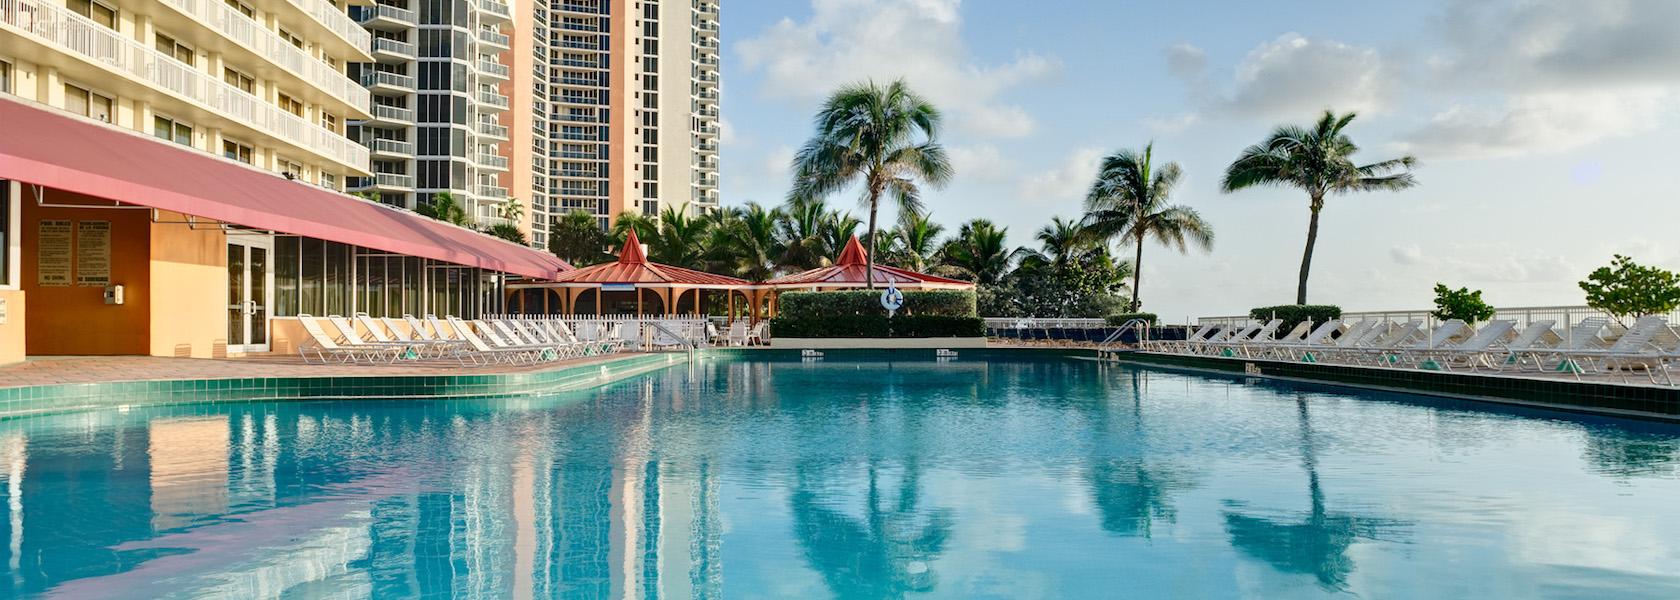 Beachside pool at Marco Polo Beach Resort